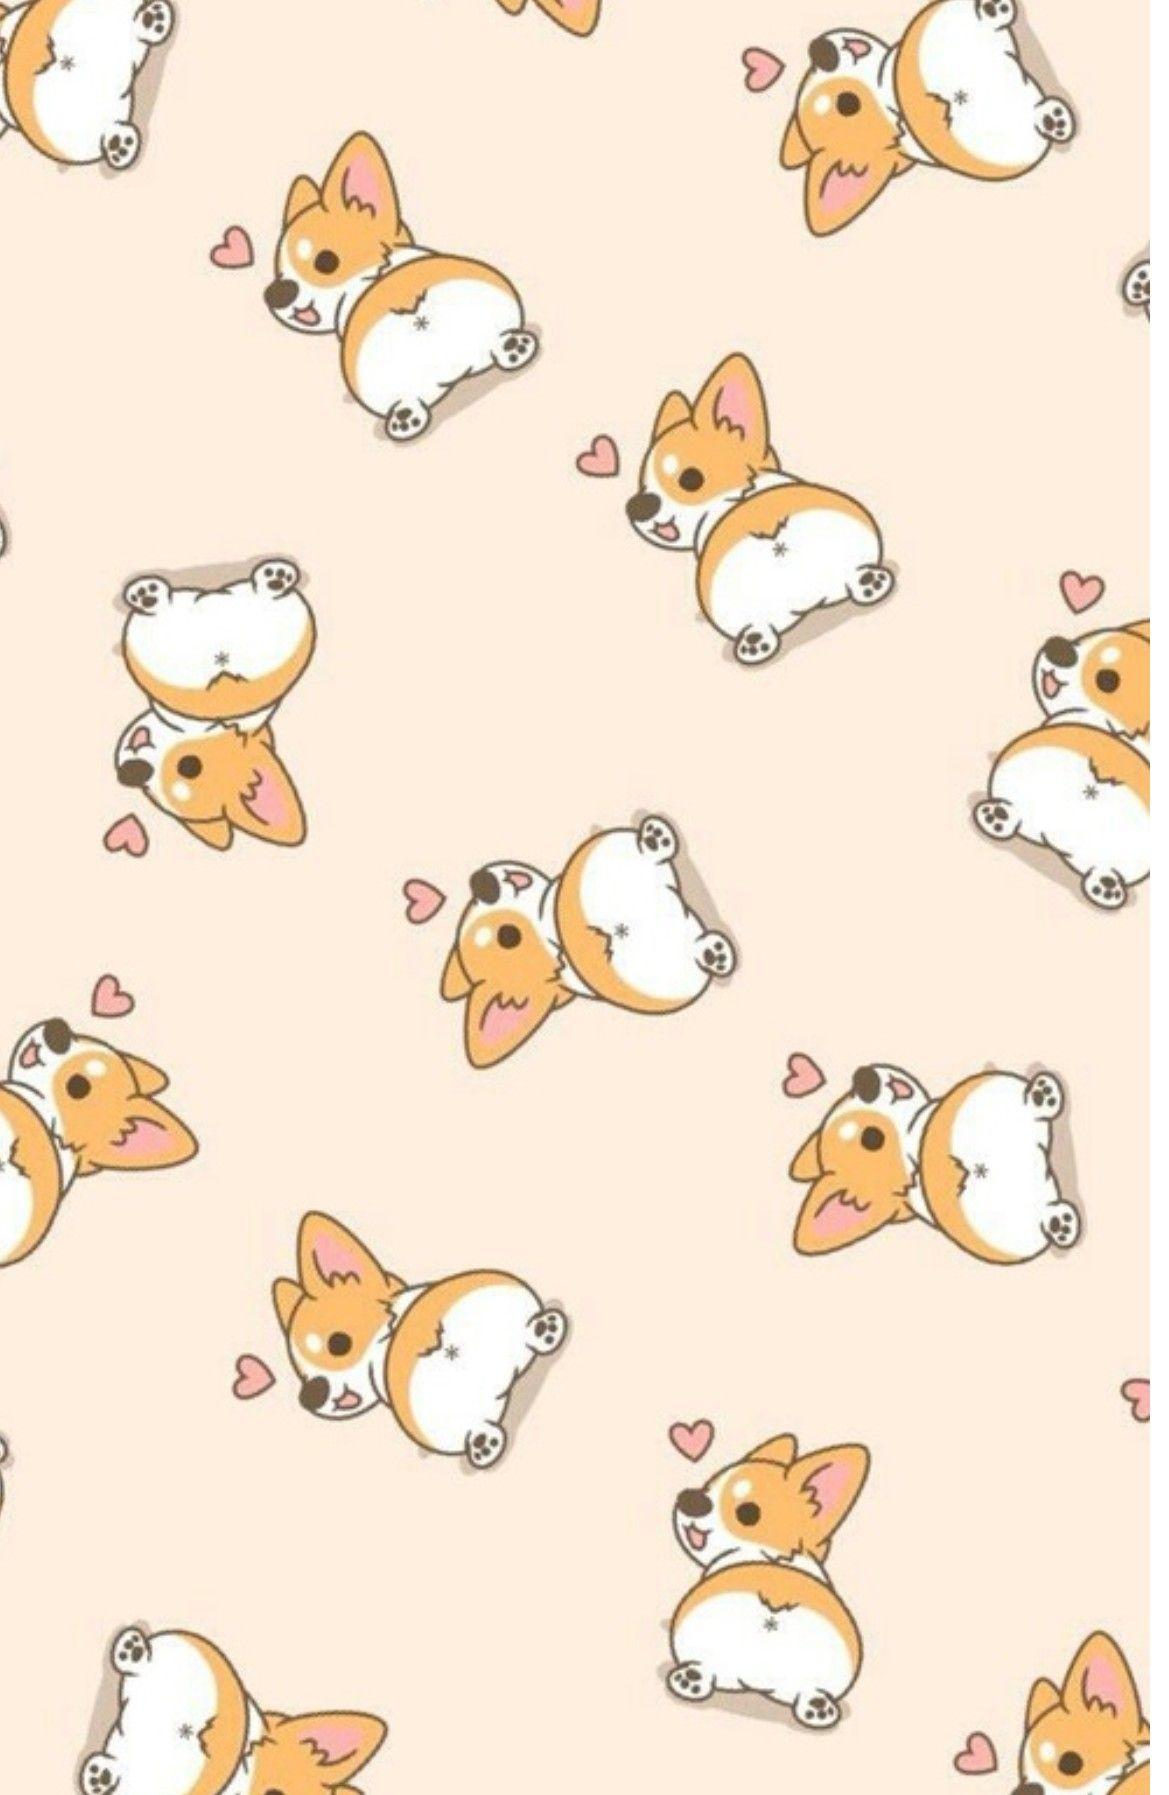 Dog Cartoon Wallpapers - Wallpaper Cave